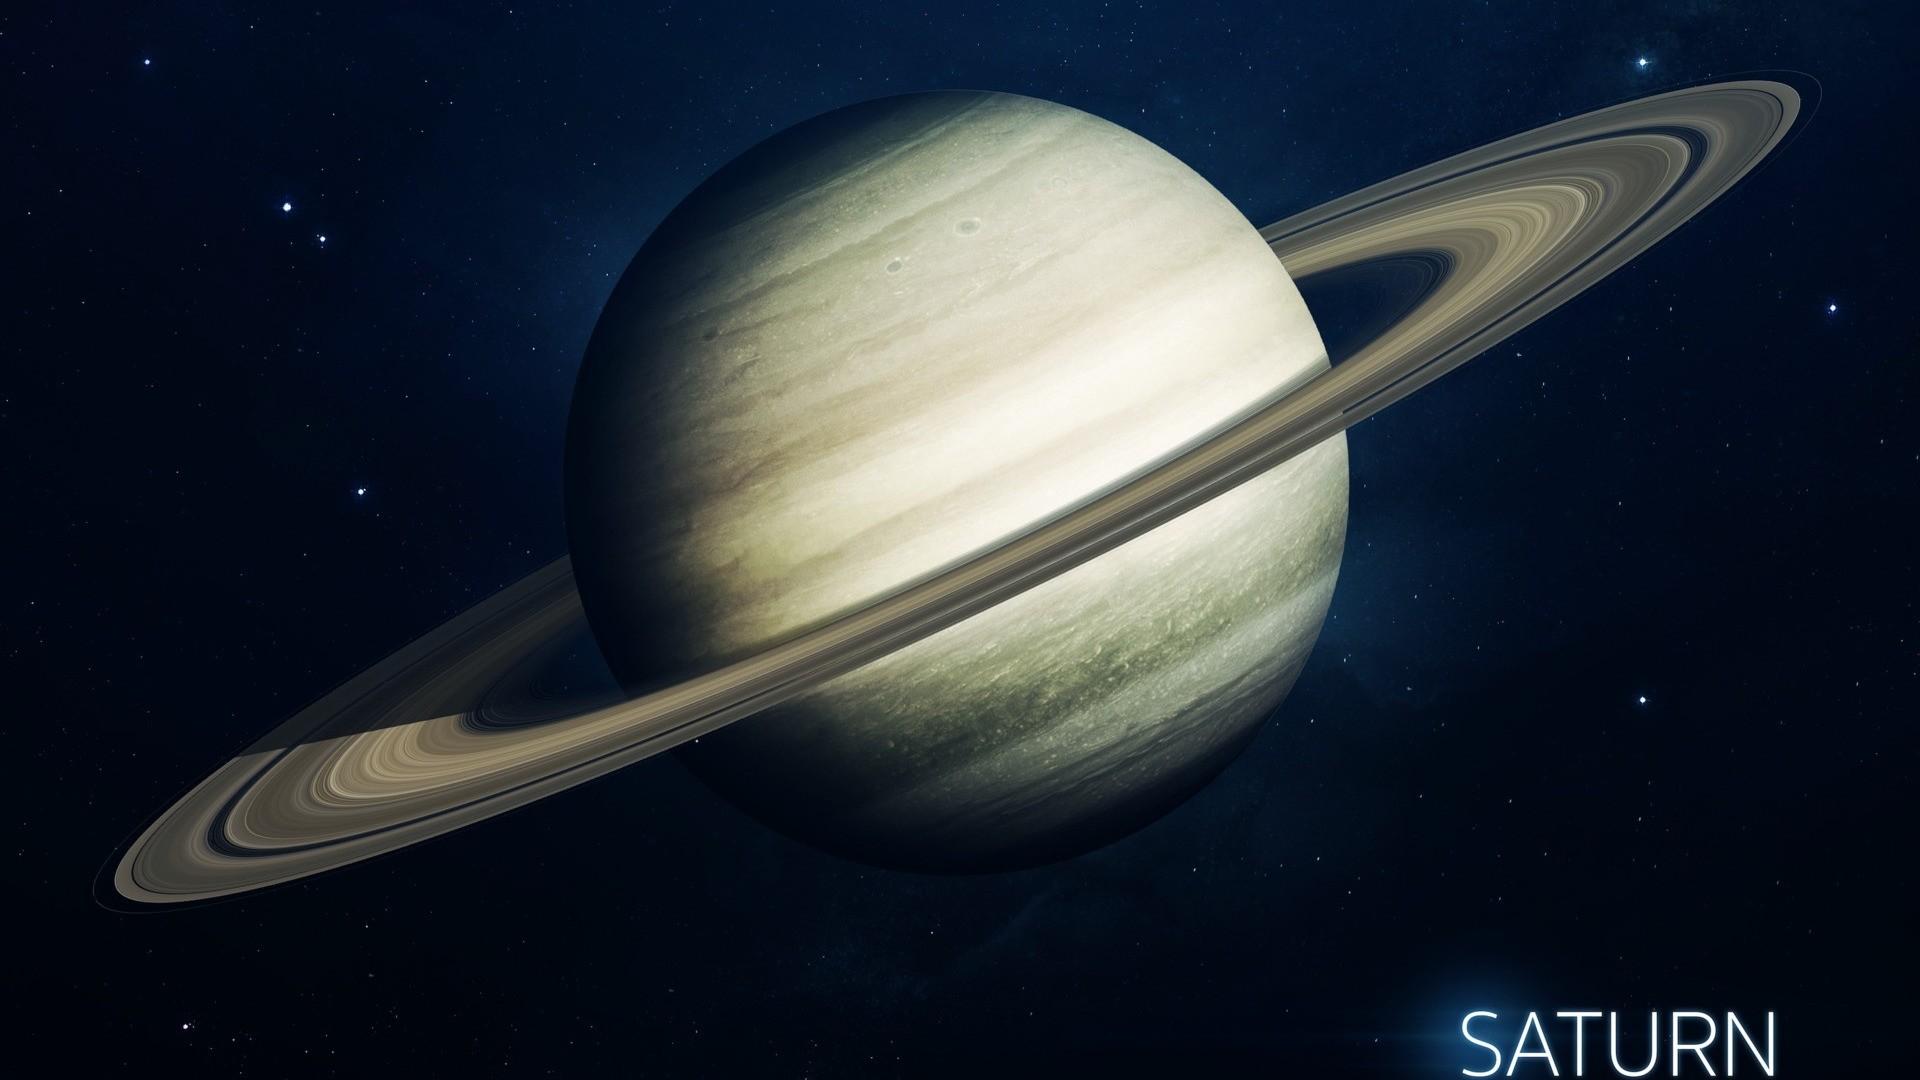 Saturn Good Wallpaper